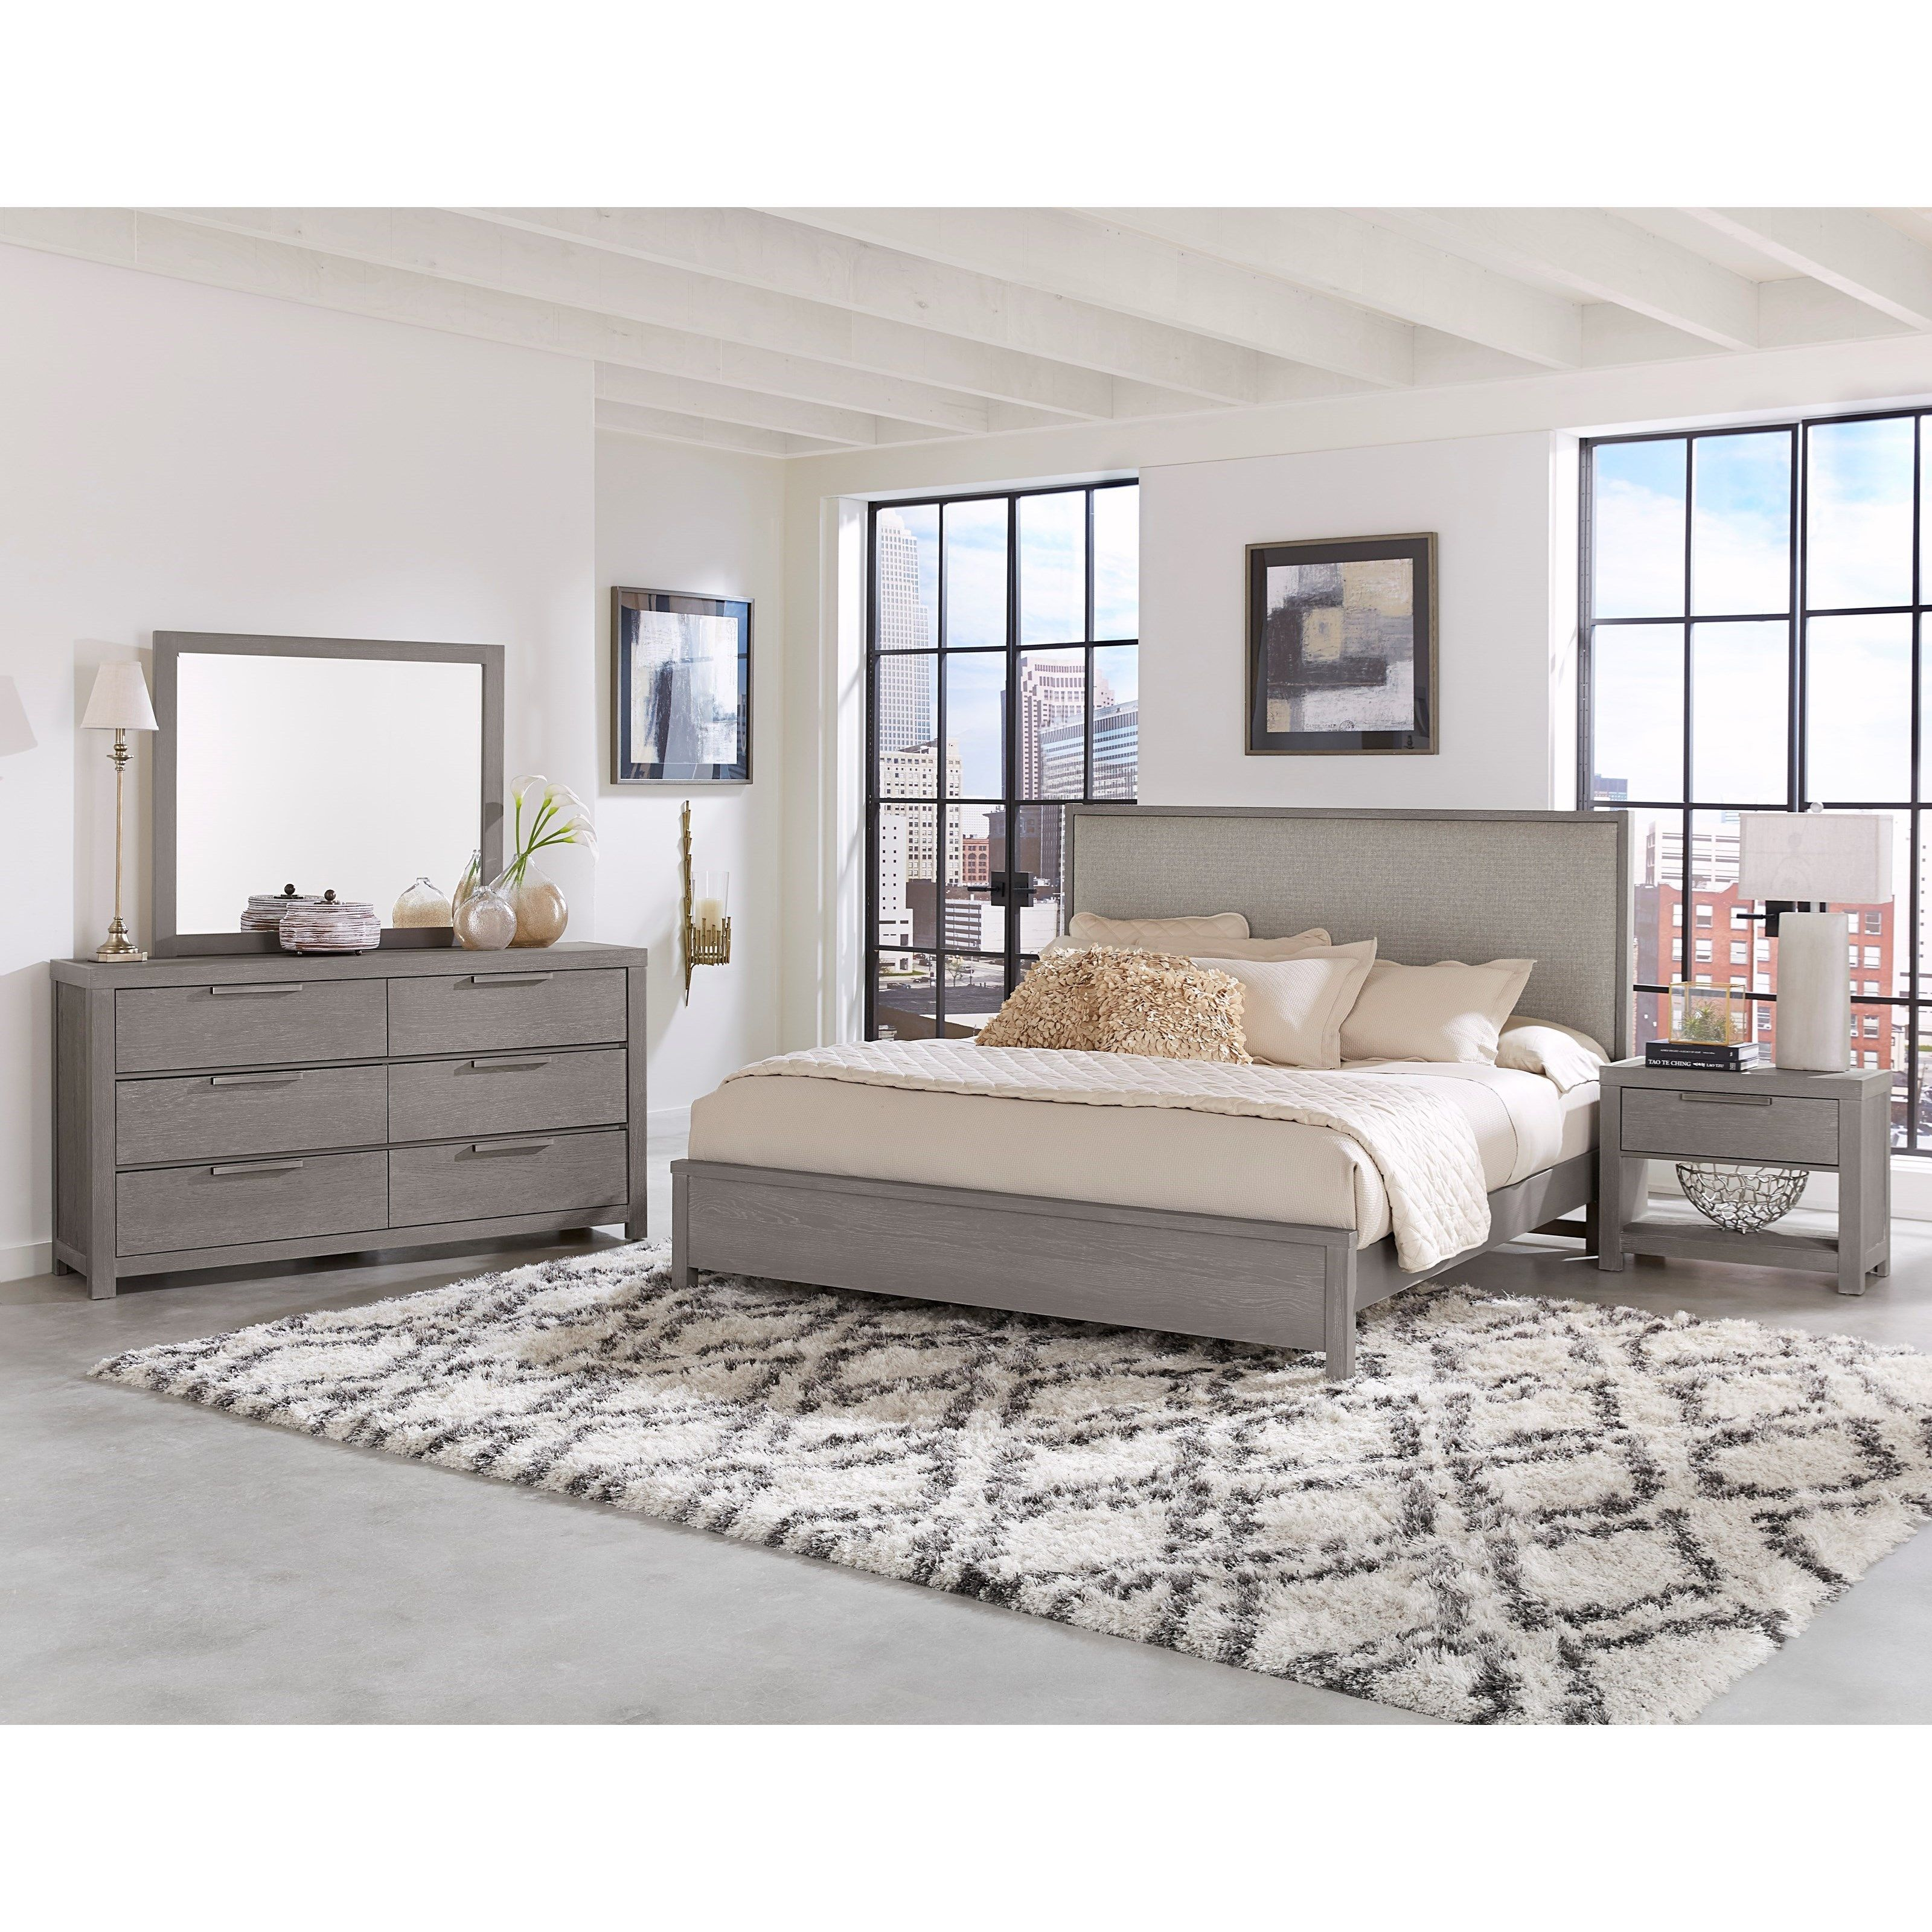 Pin by Kristen Mascha on Halifax  Modern bedroom furniture sets